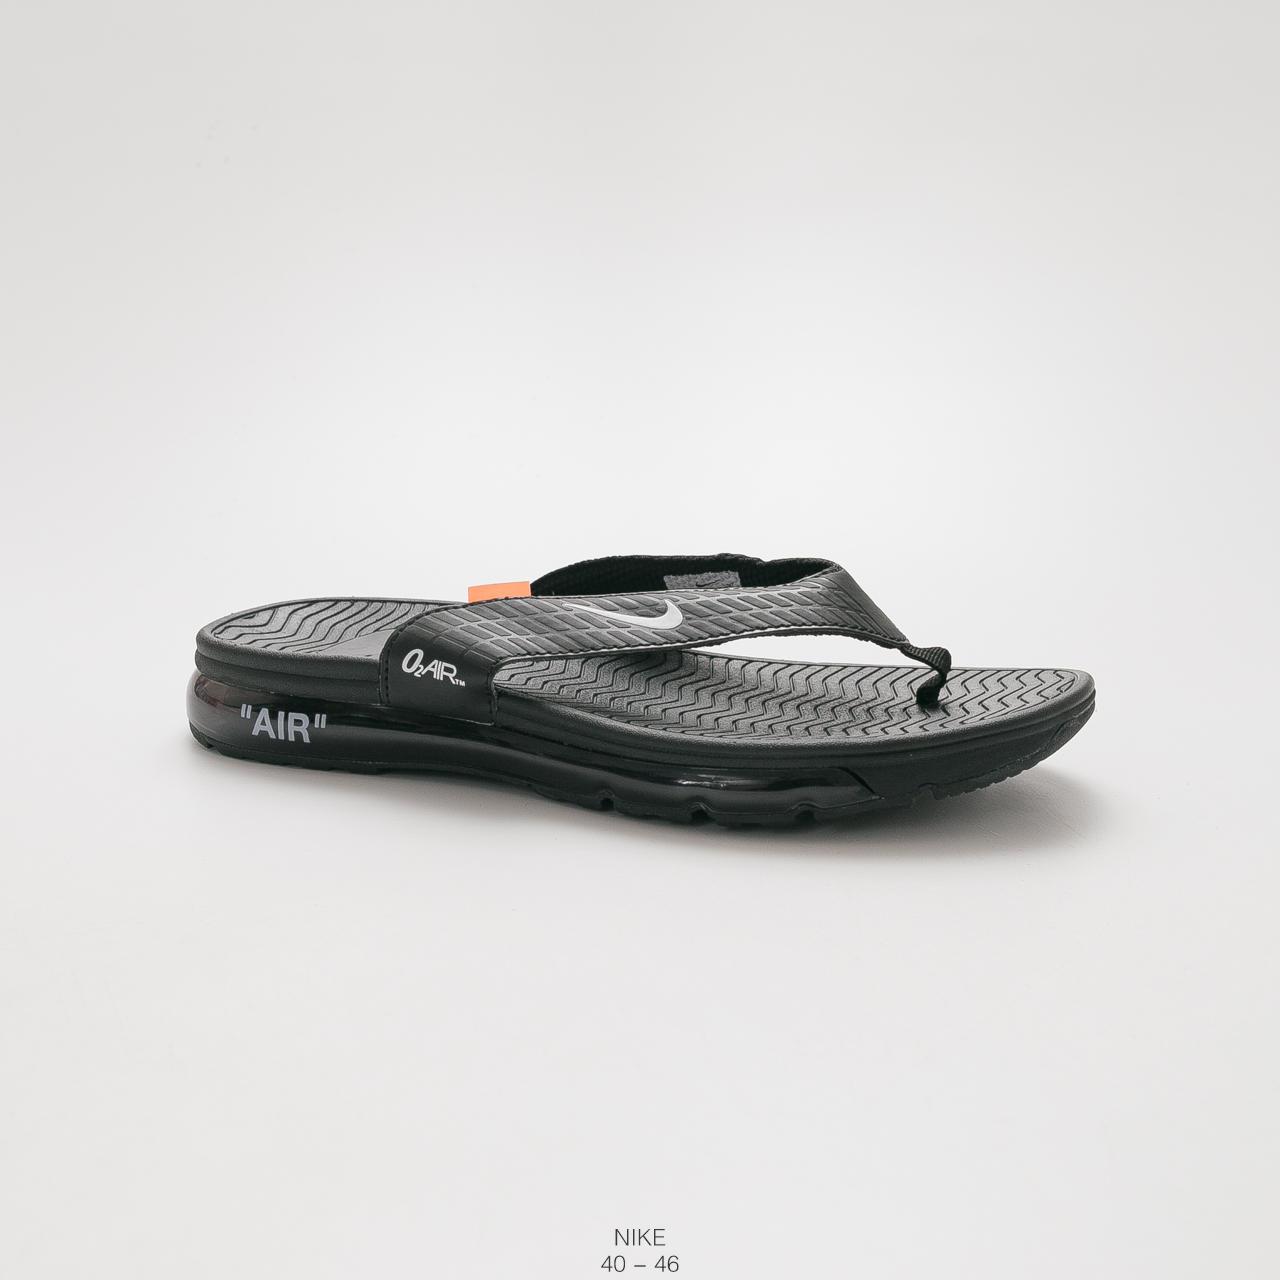 official photos 70818 00d64 NIKE Original Men's Air Cushion Sandal Slippers Adults black 40